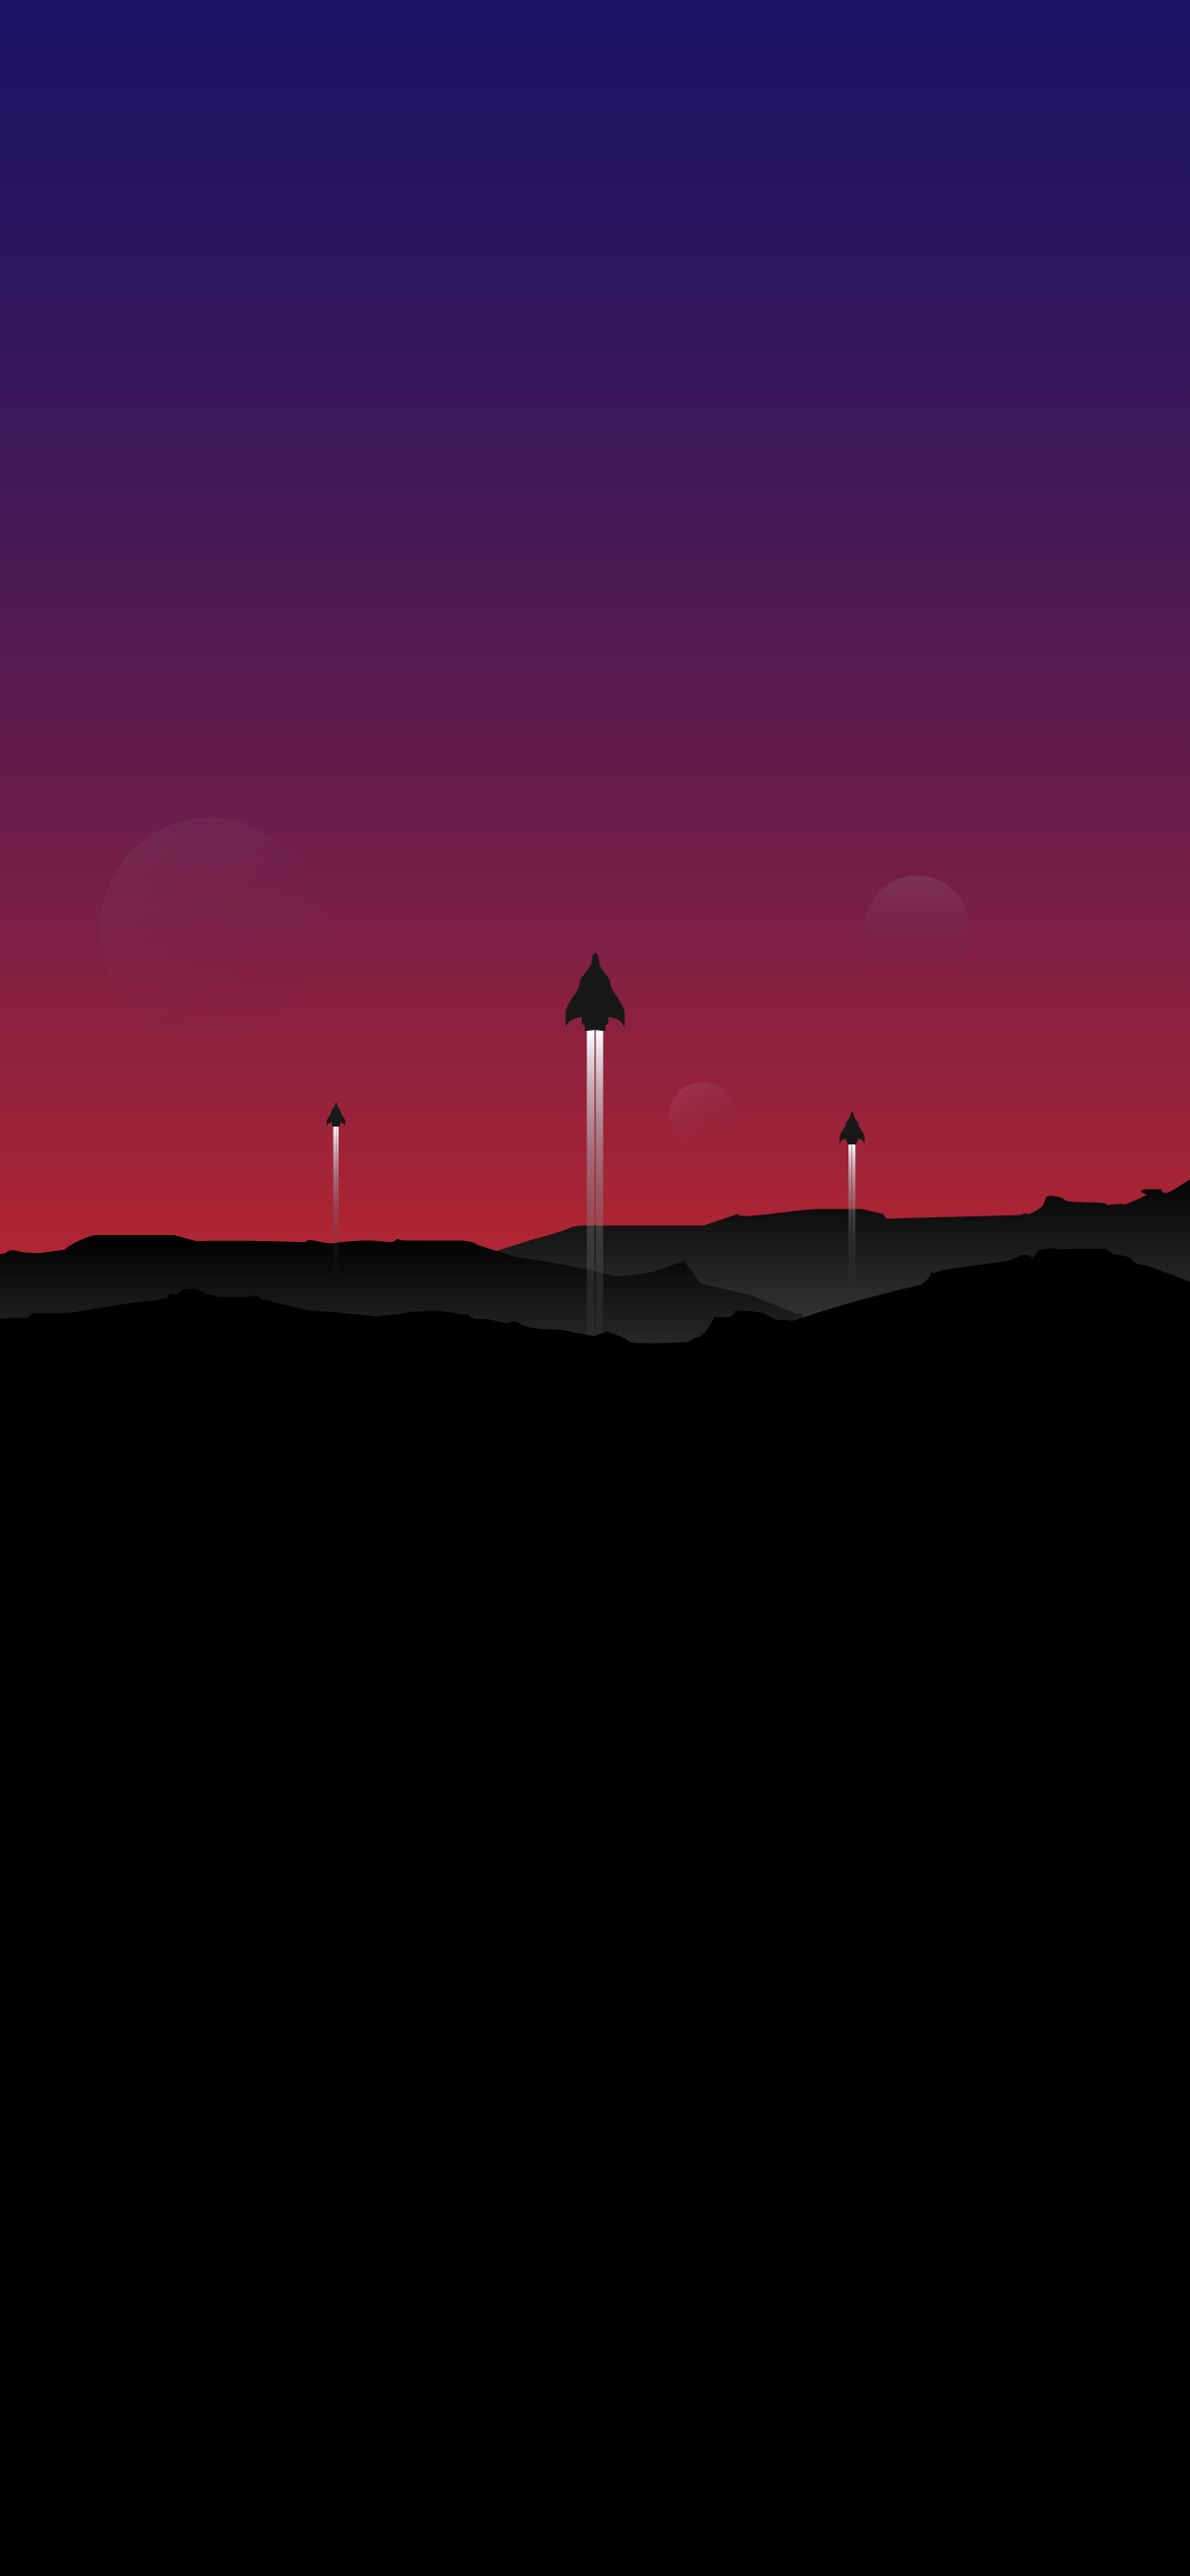 iphone wallpaper 4k mission spaceship futuristic sci-fi space background